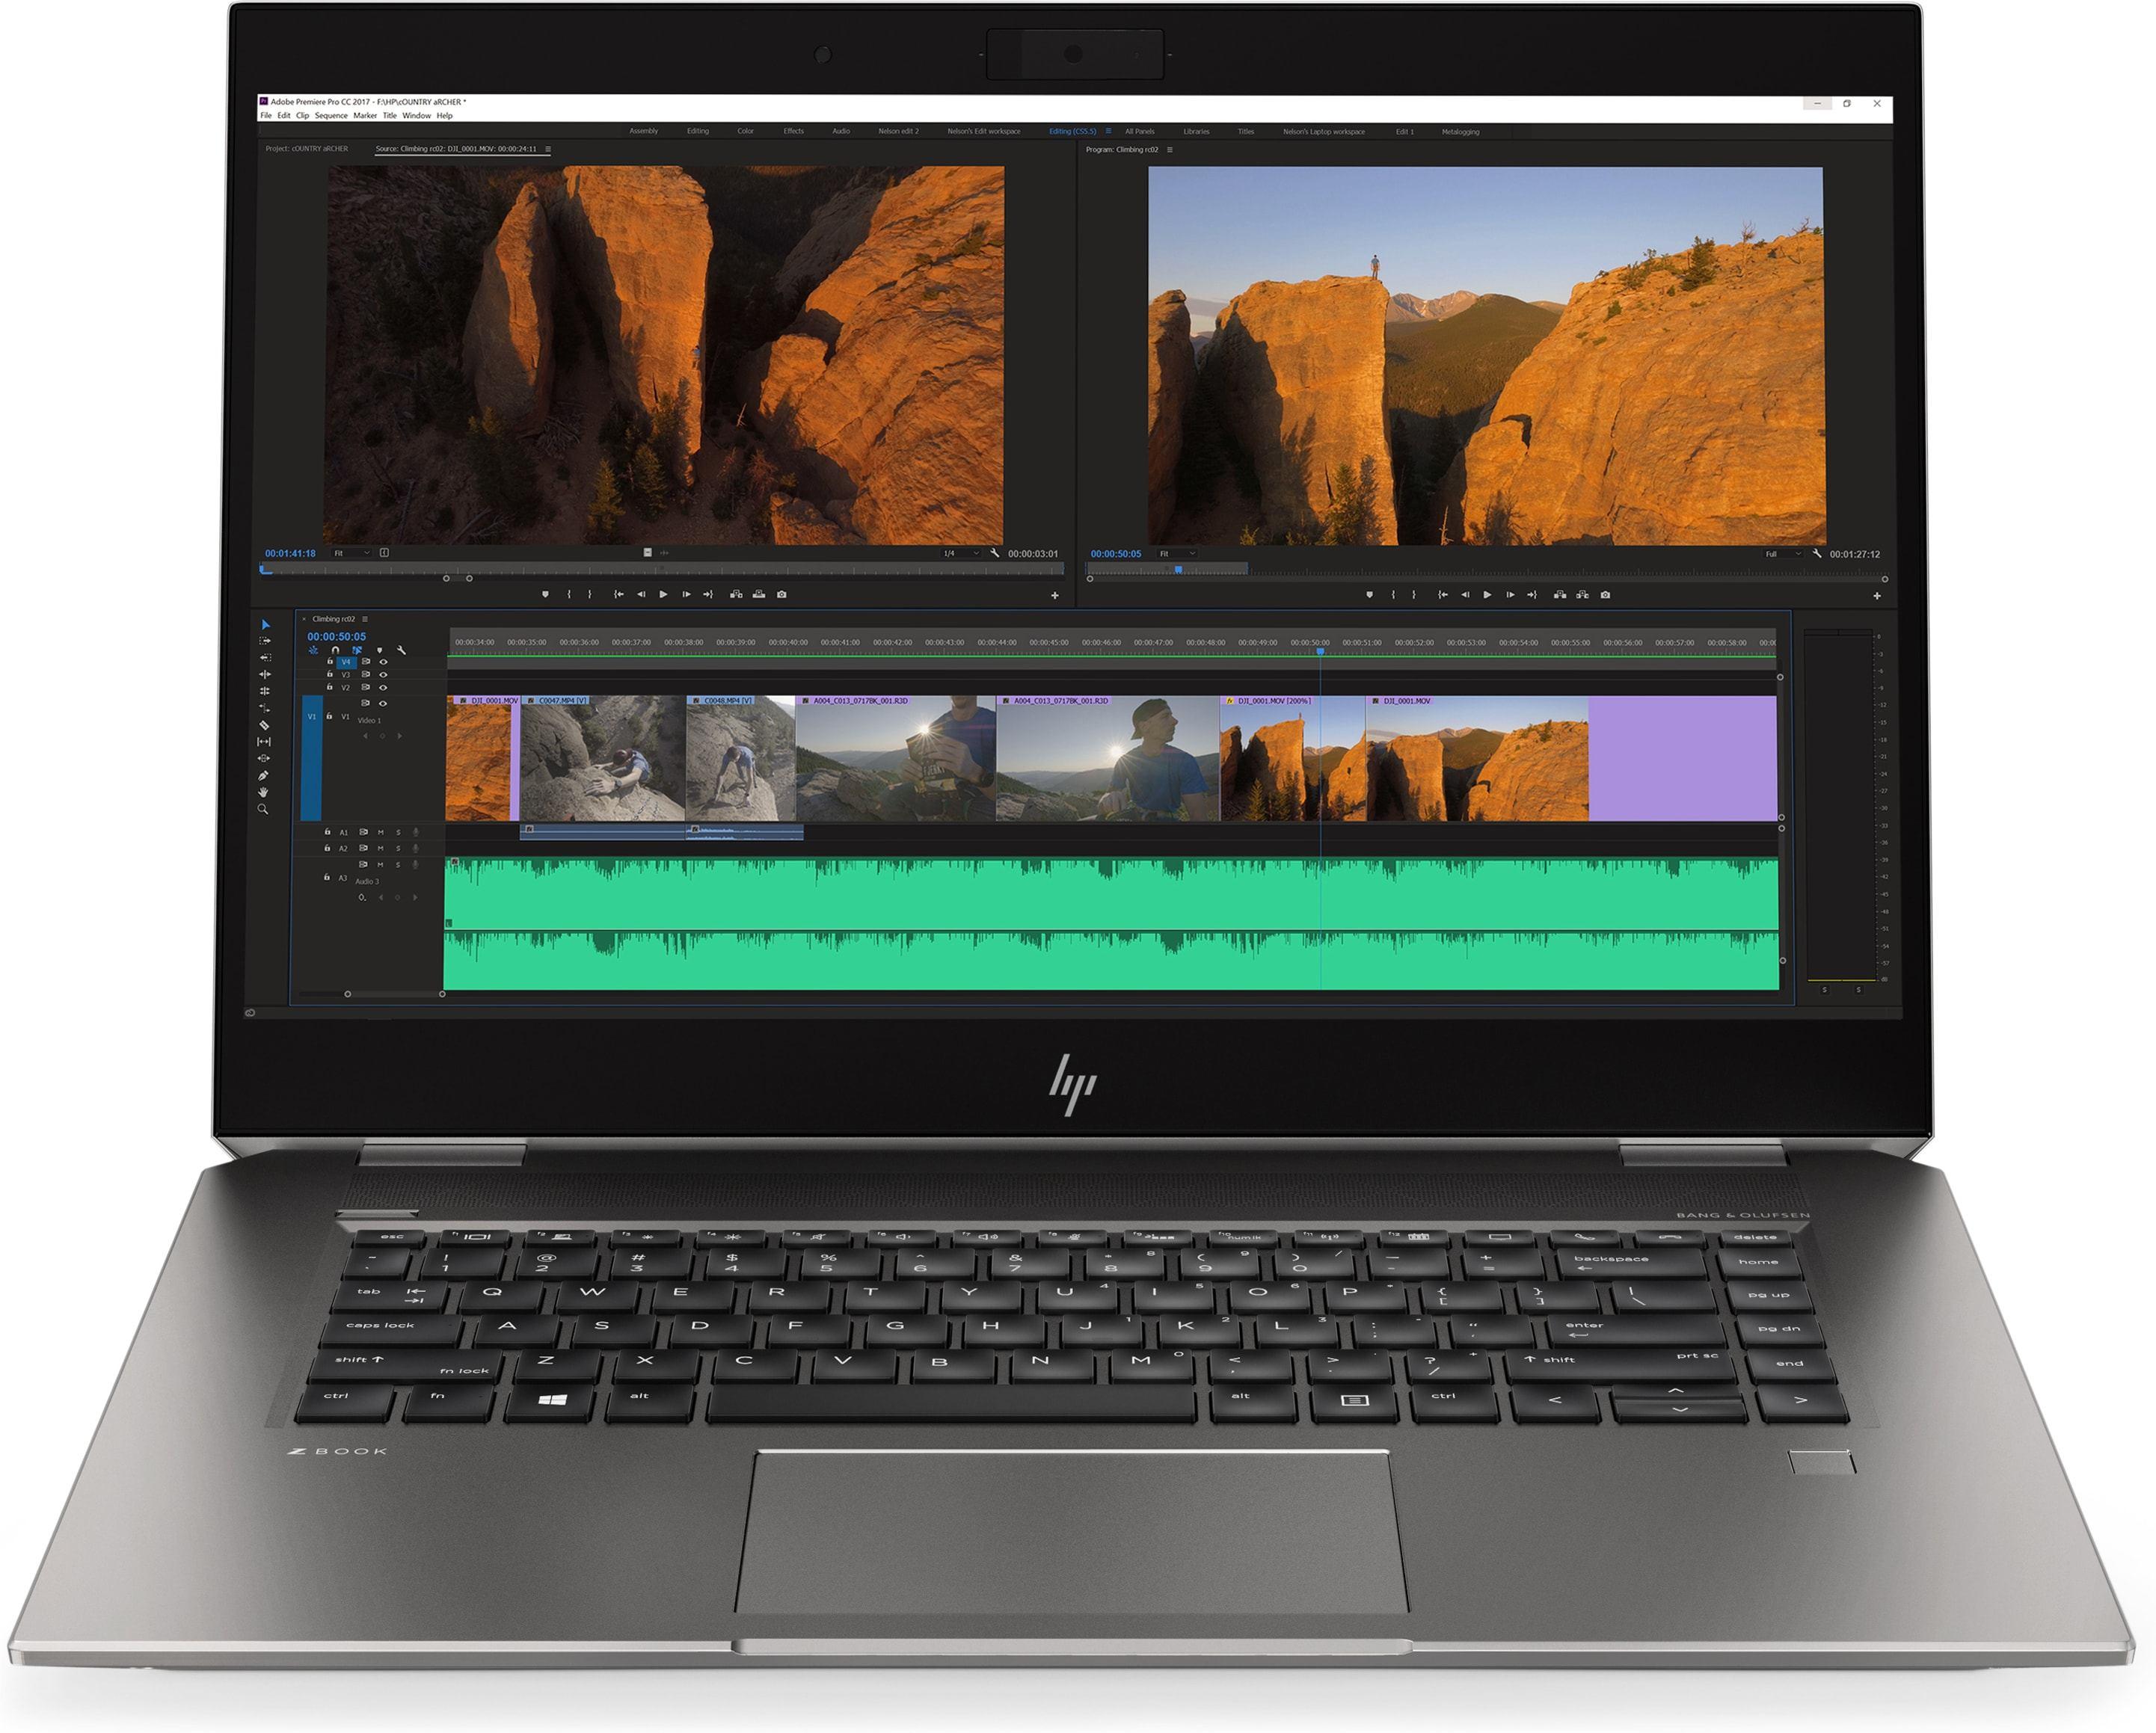 HP ZBook Studio G5 Silver Mobile workstation 39 6 cm [15 6